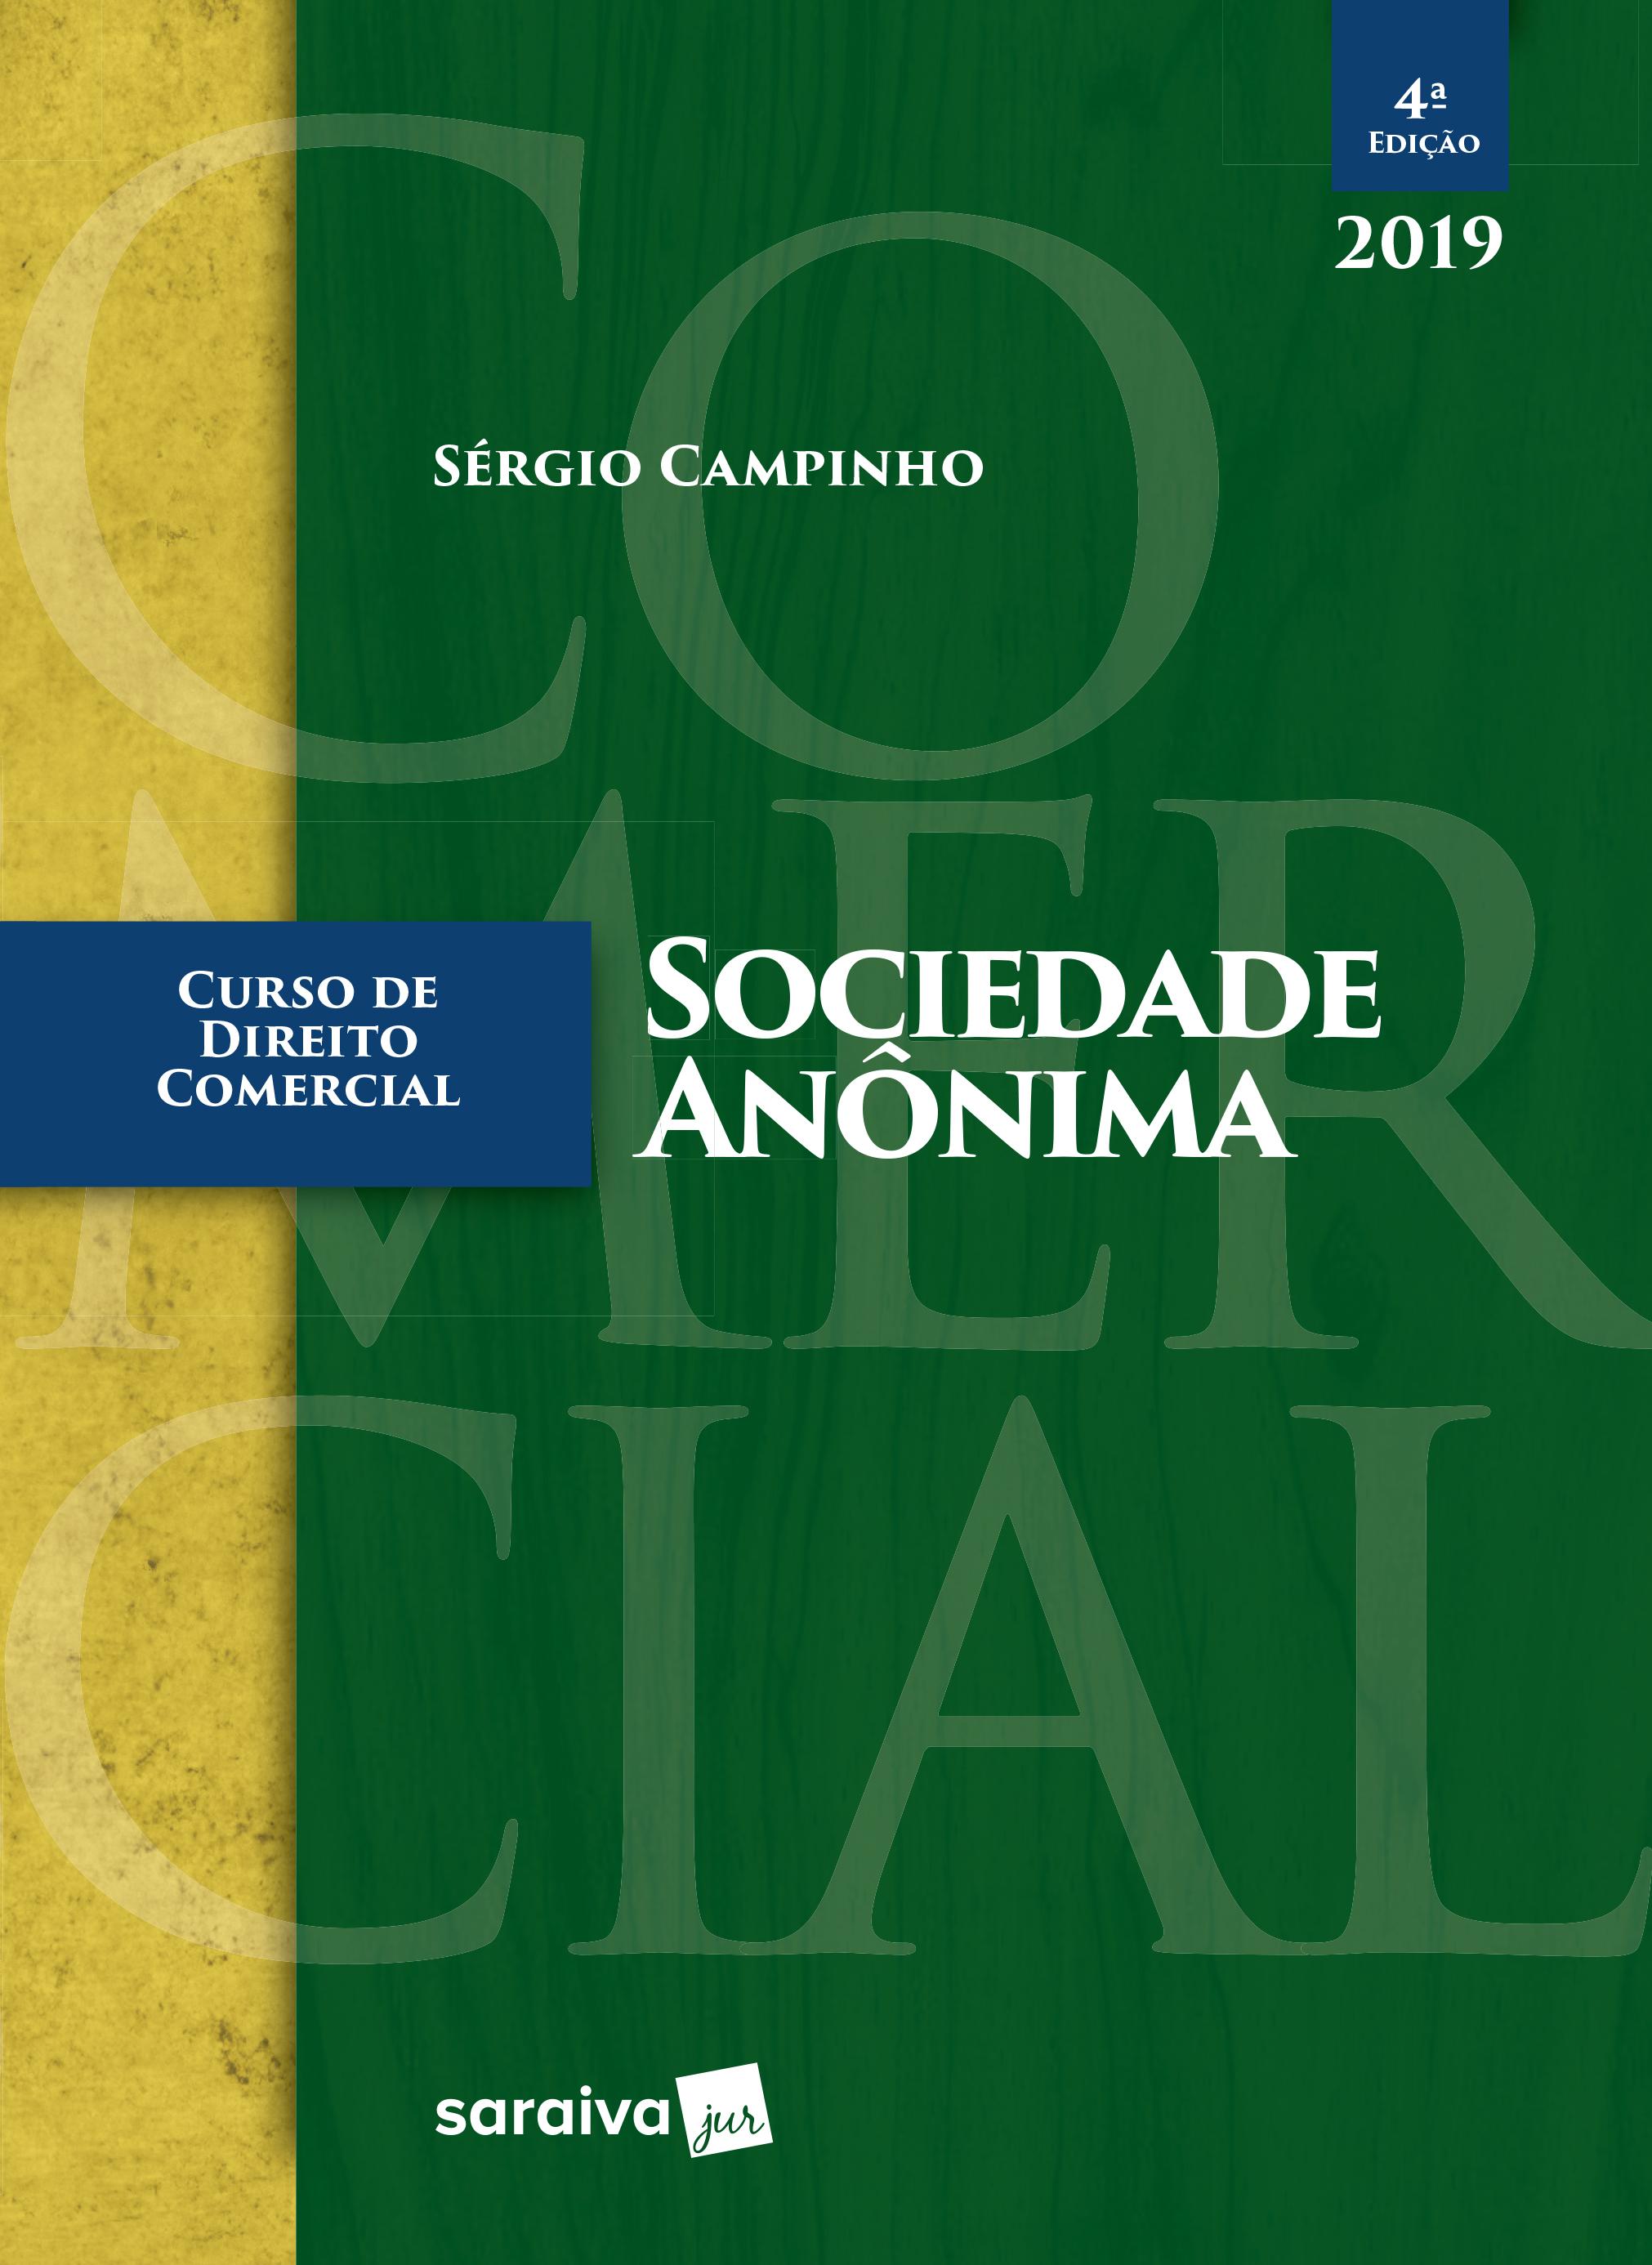 Curso_de_direito_comercial_sociedade_anonima_sergio_campinho-4edfrente